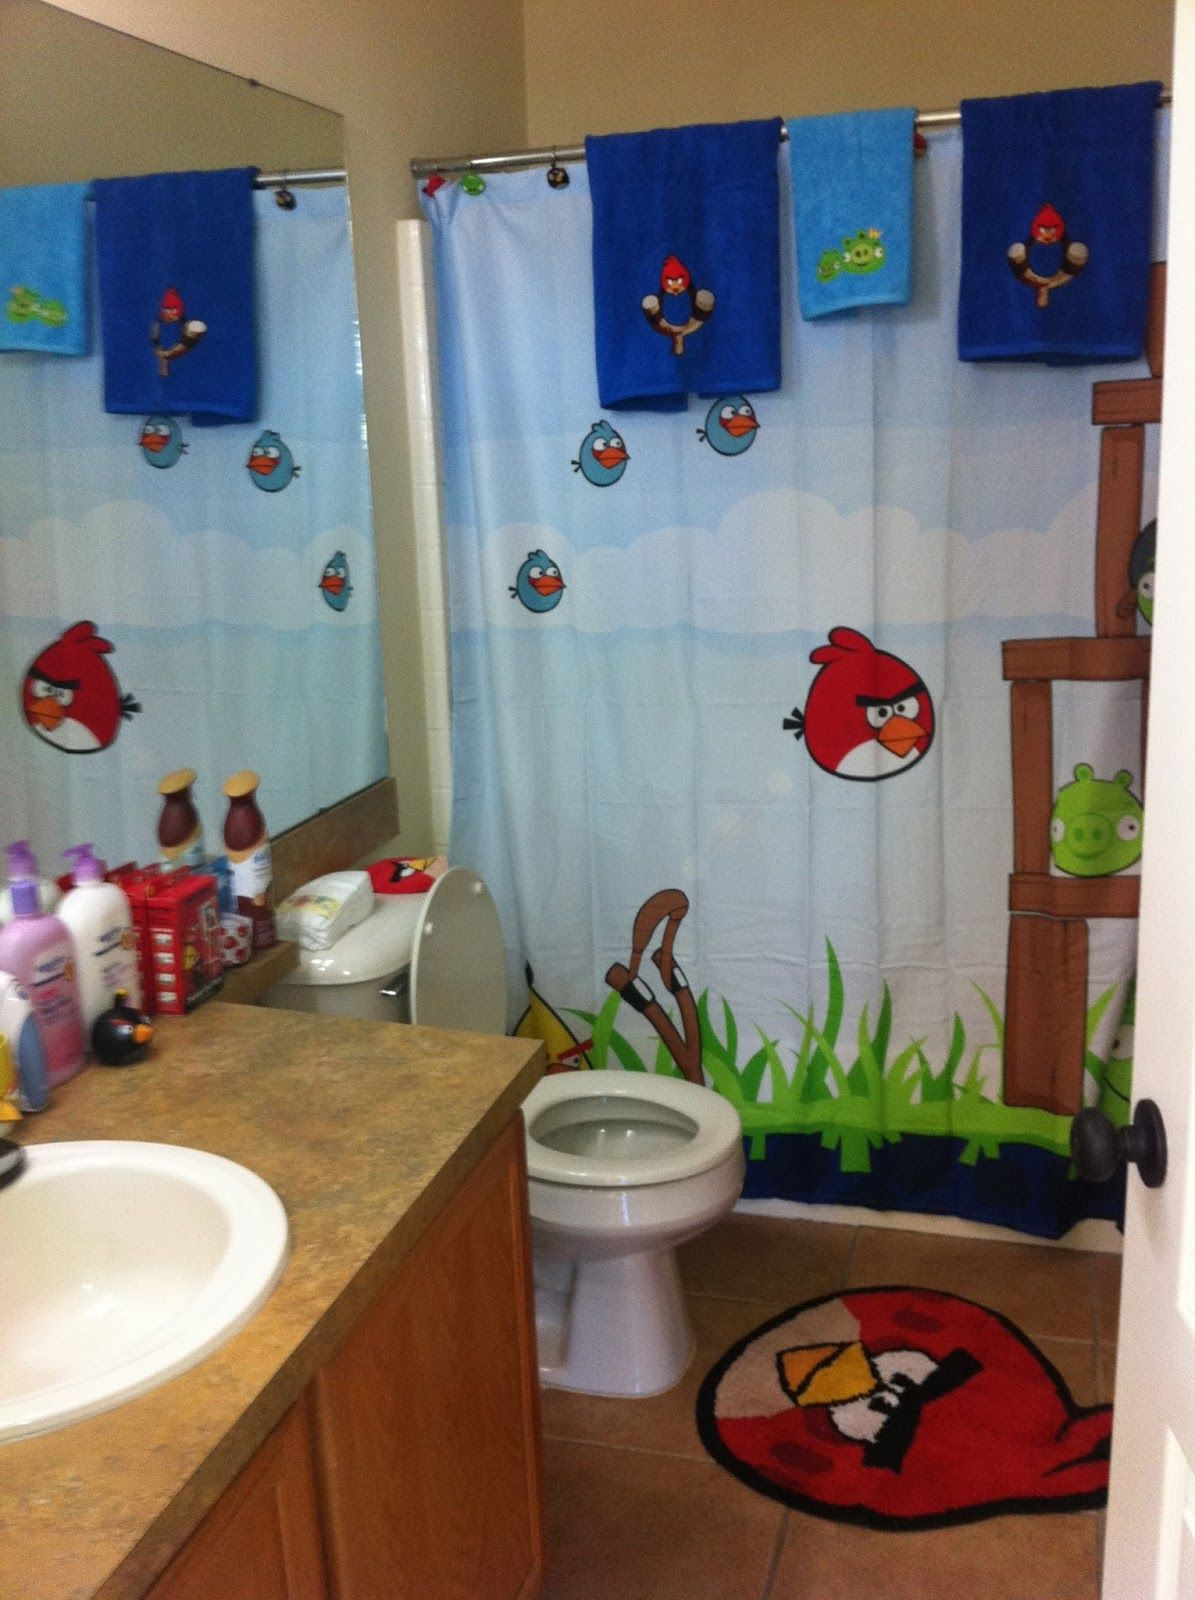 Angry birds bathroom set